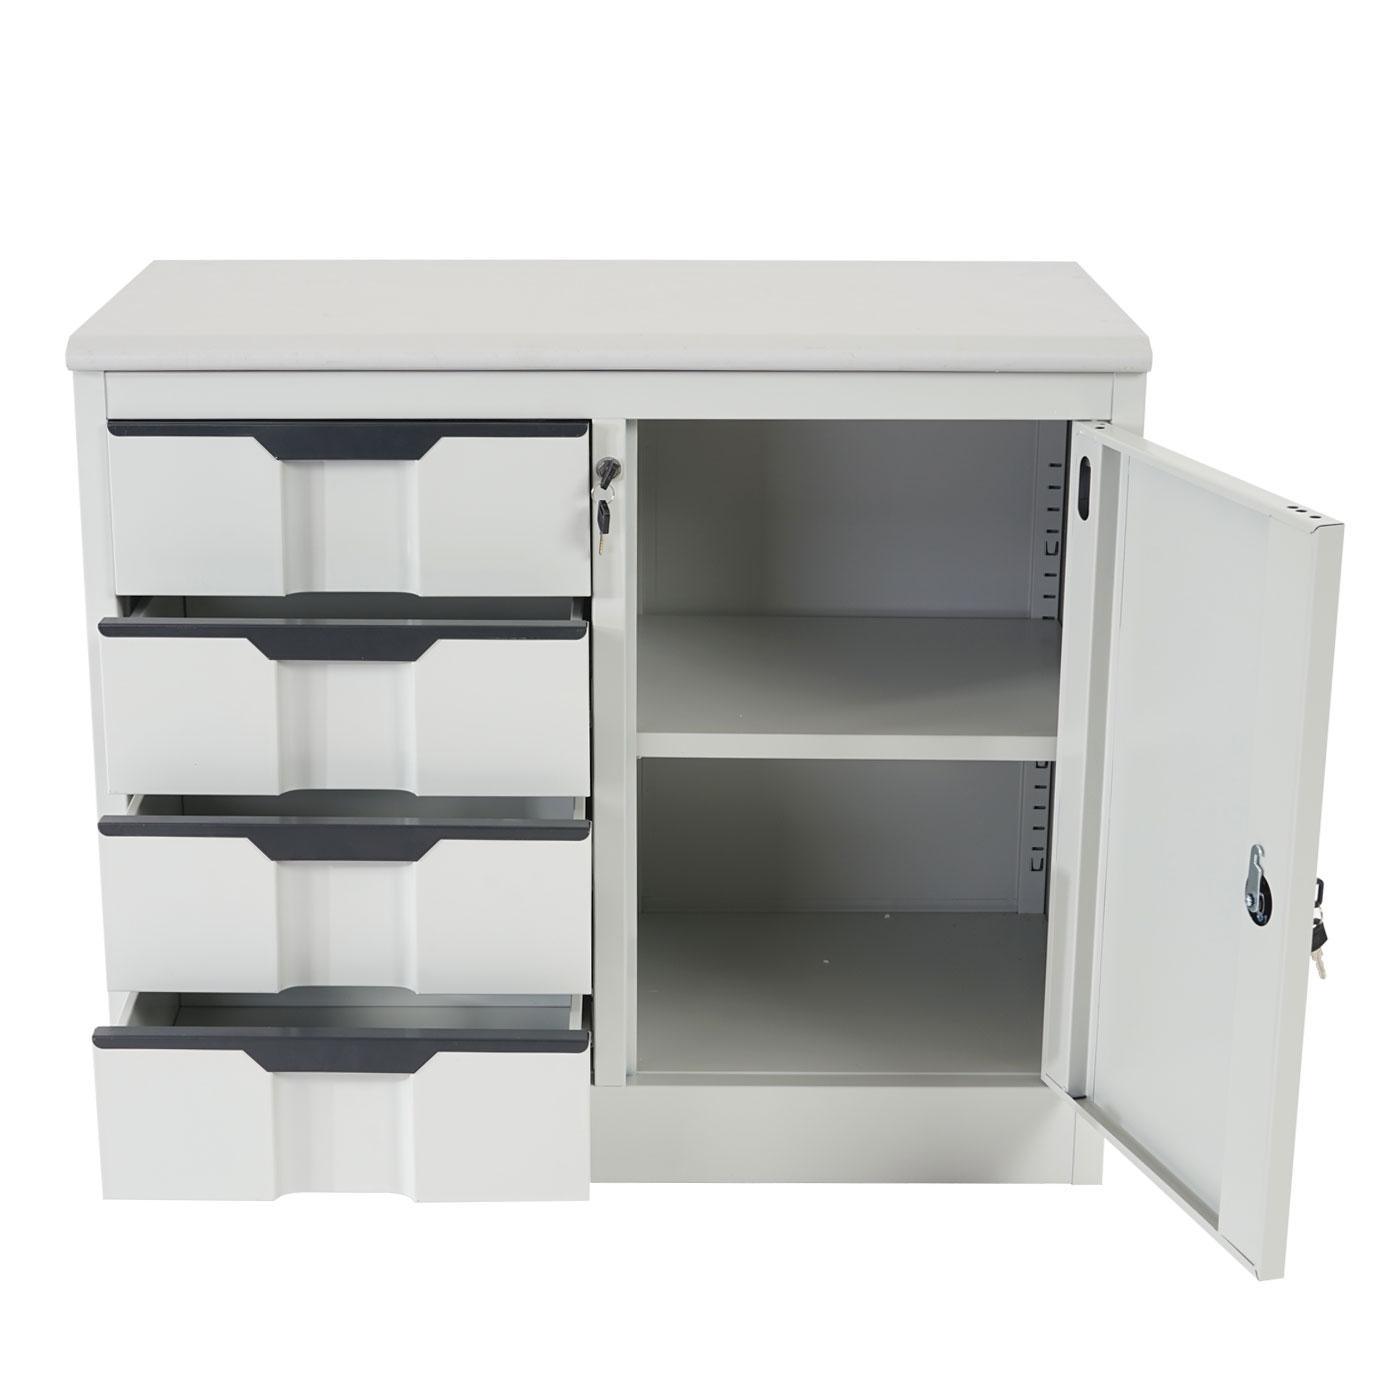 aktenschrank boston t310 b roschrank metallschrank 4. Black Bedroom Furniture Sets. Home Design Ideas